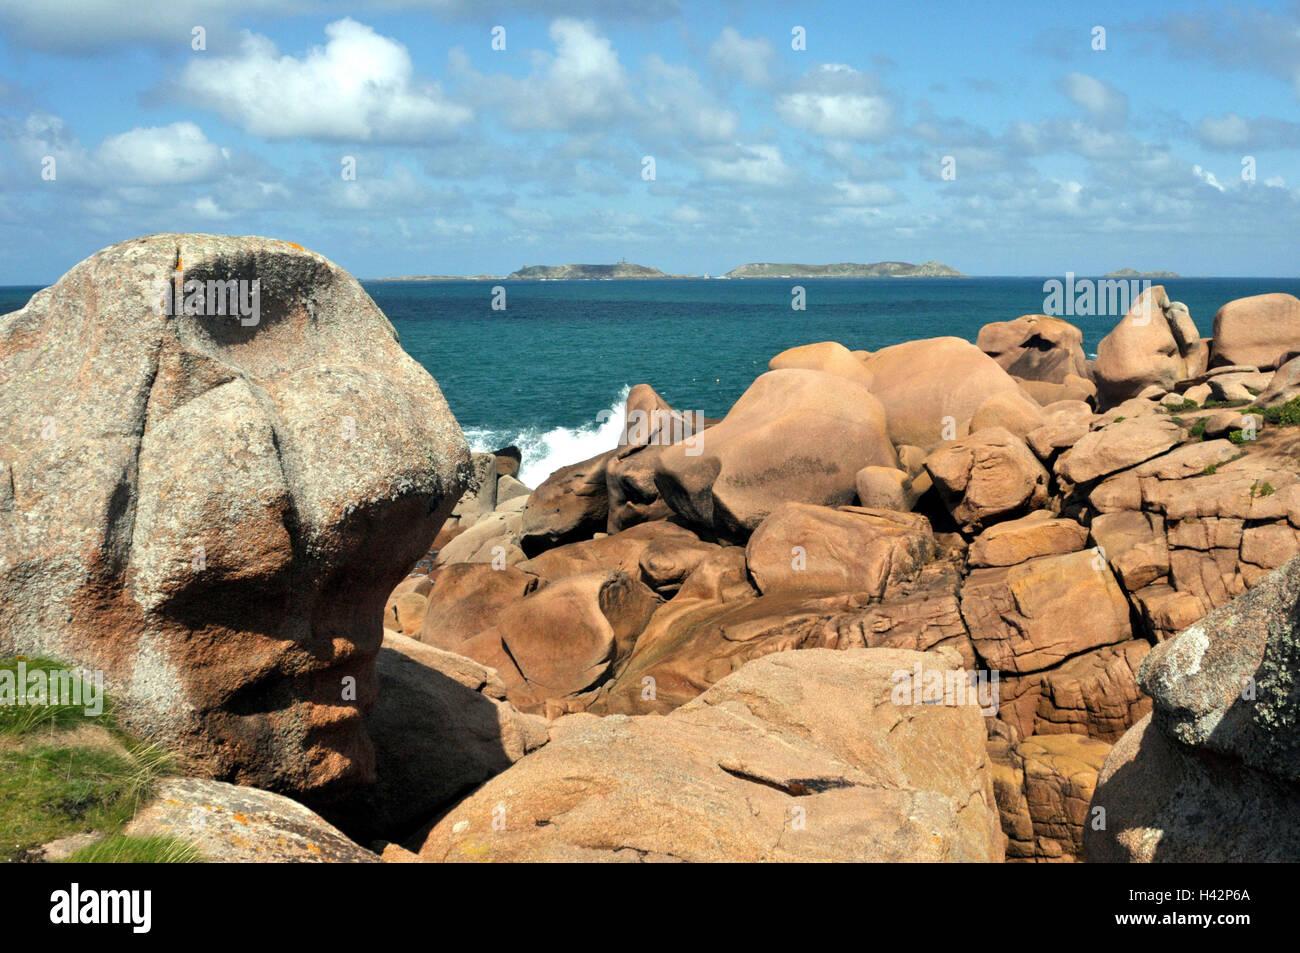 France, Brittany, St. Guirec, bile coast, - Stock Image